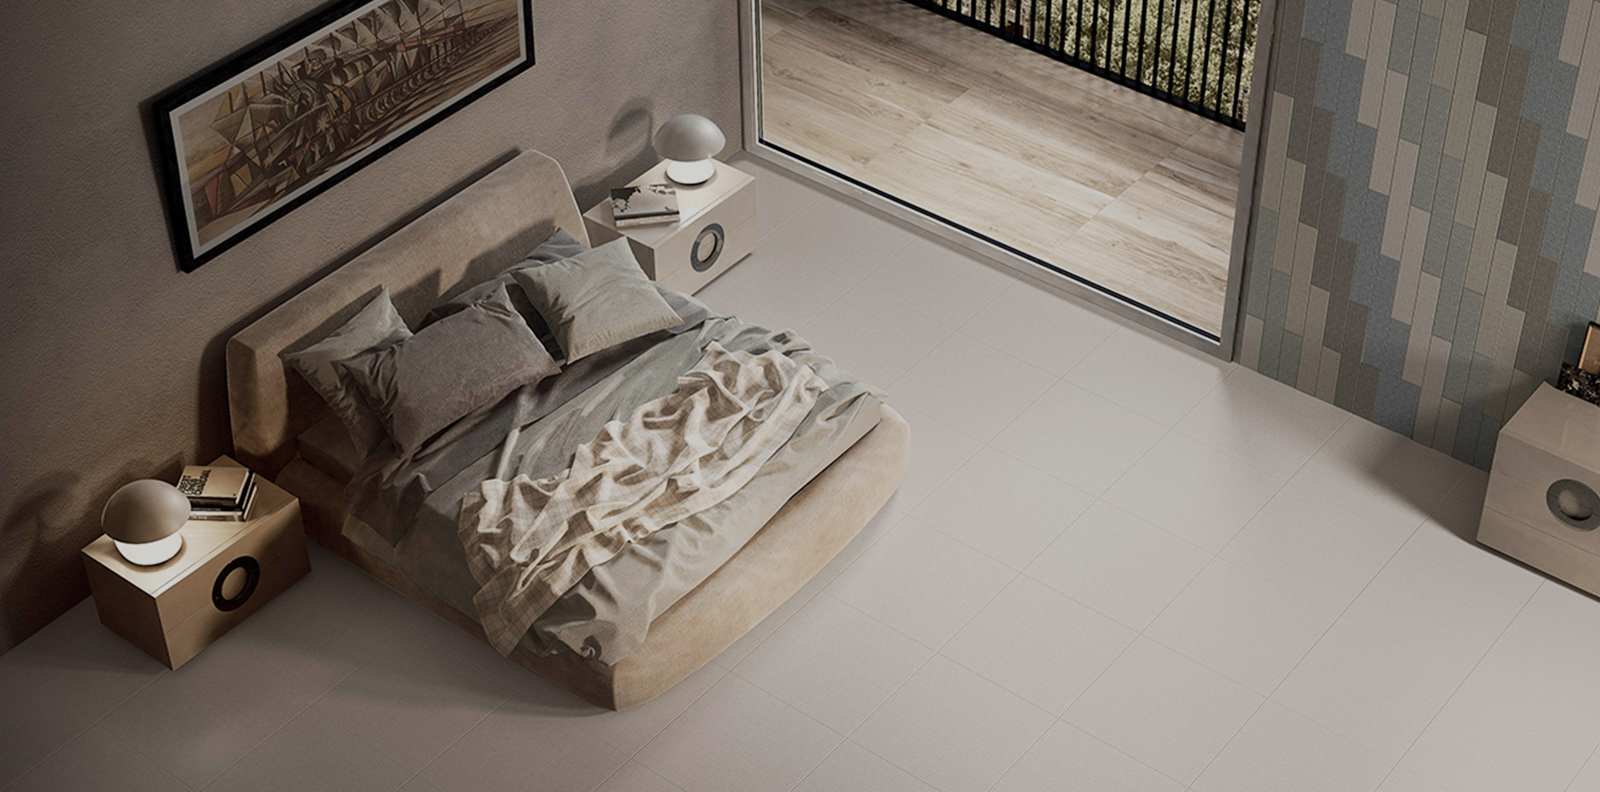 fliesen langenfeld beautiful ikea lack tisch mit fliesen. Black Bedroom Furniture Sets. Home Design Ideas